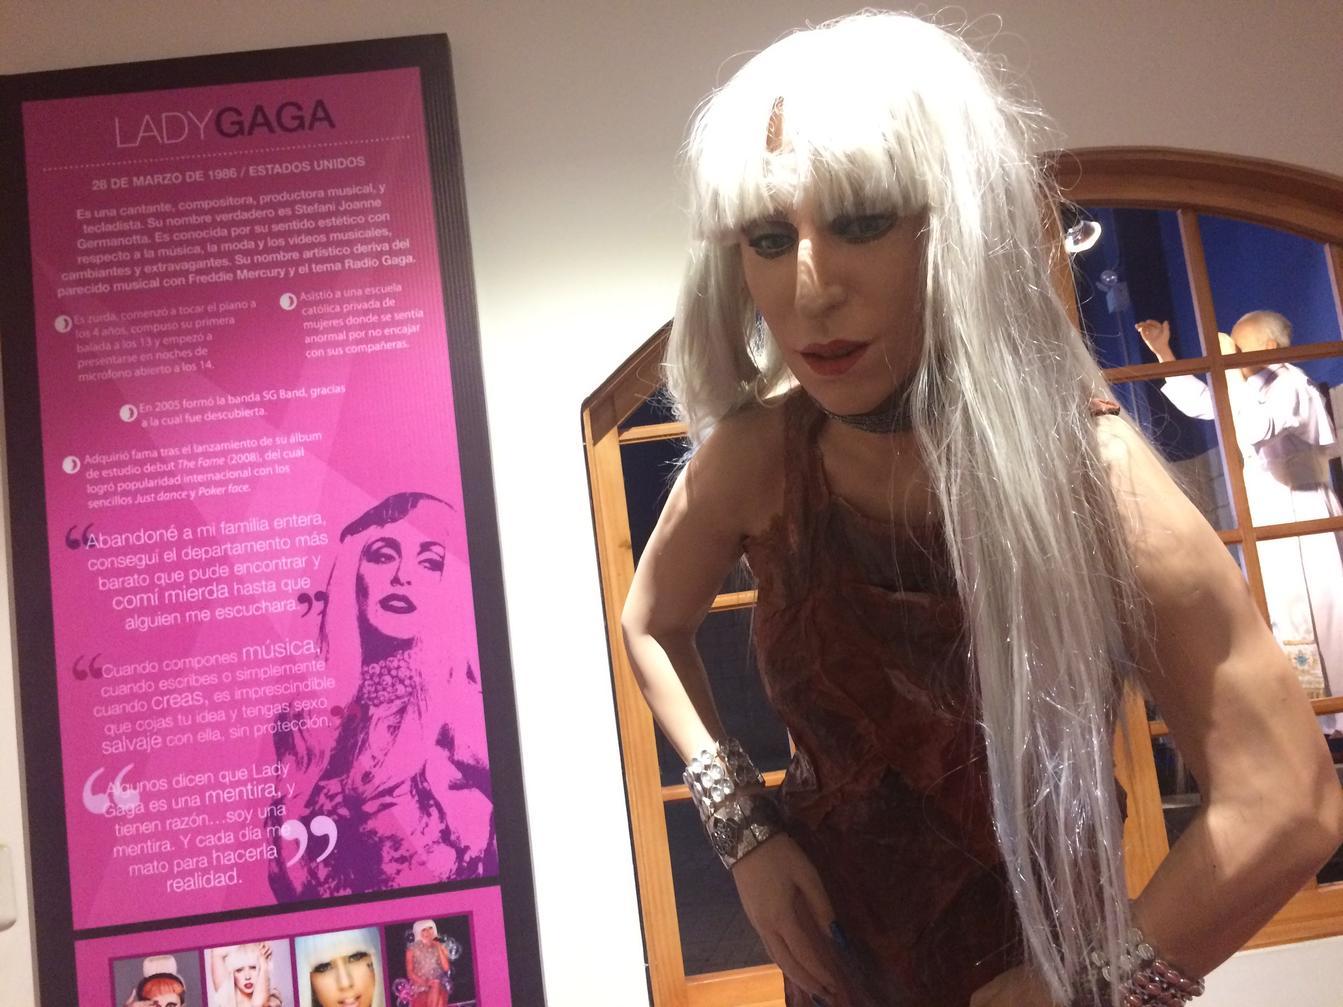 Lady Gaga de cera